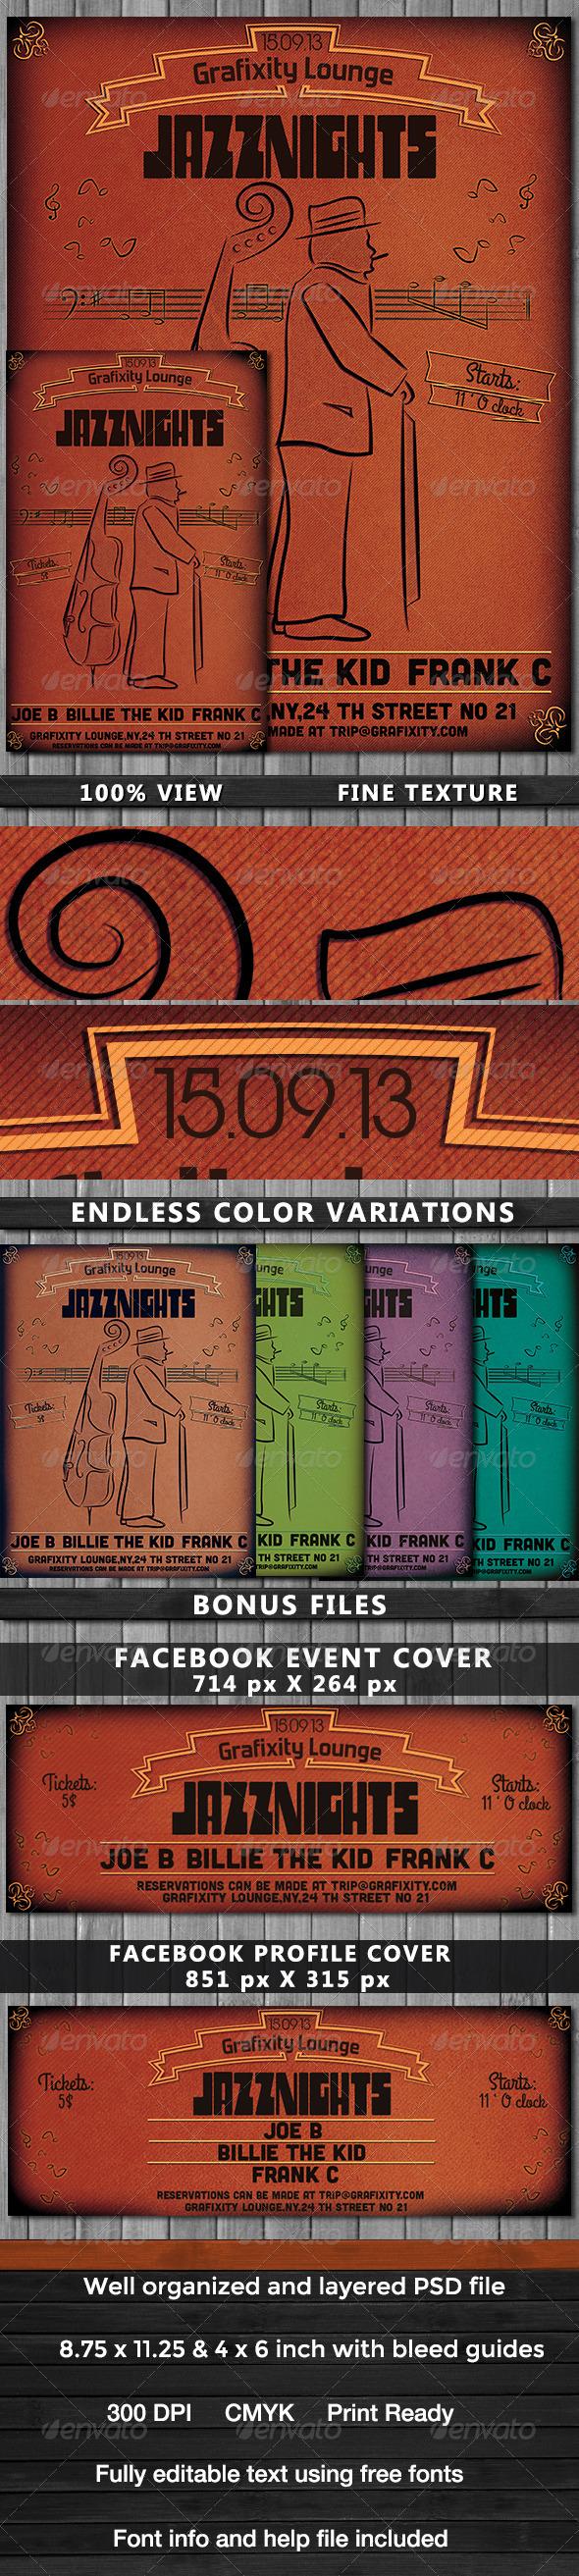 GraphicRiver JazzNights Vintage Retro Poster & Flyer 5488891